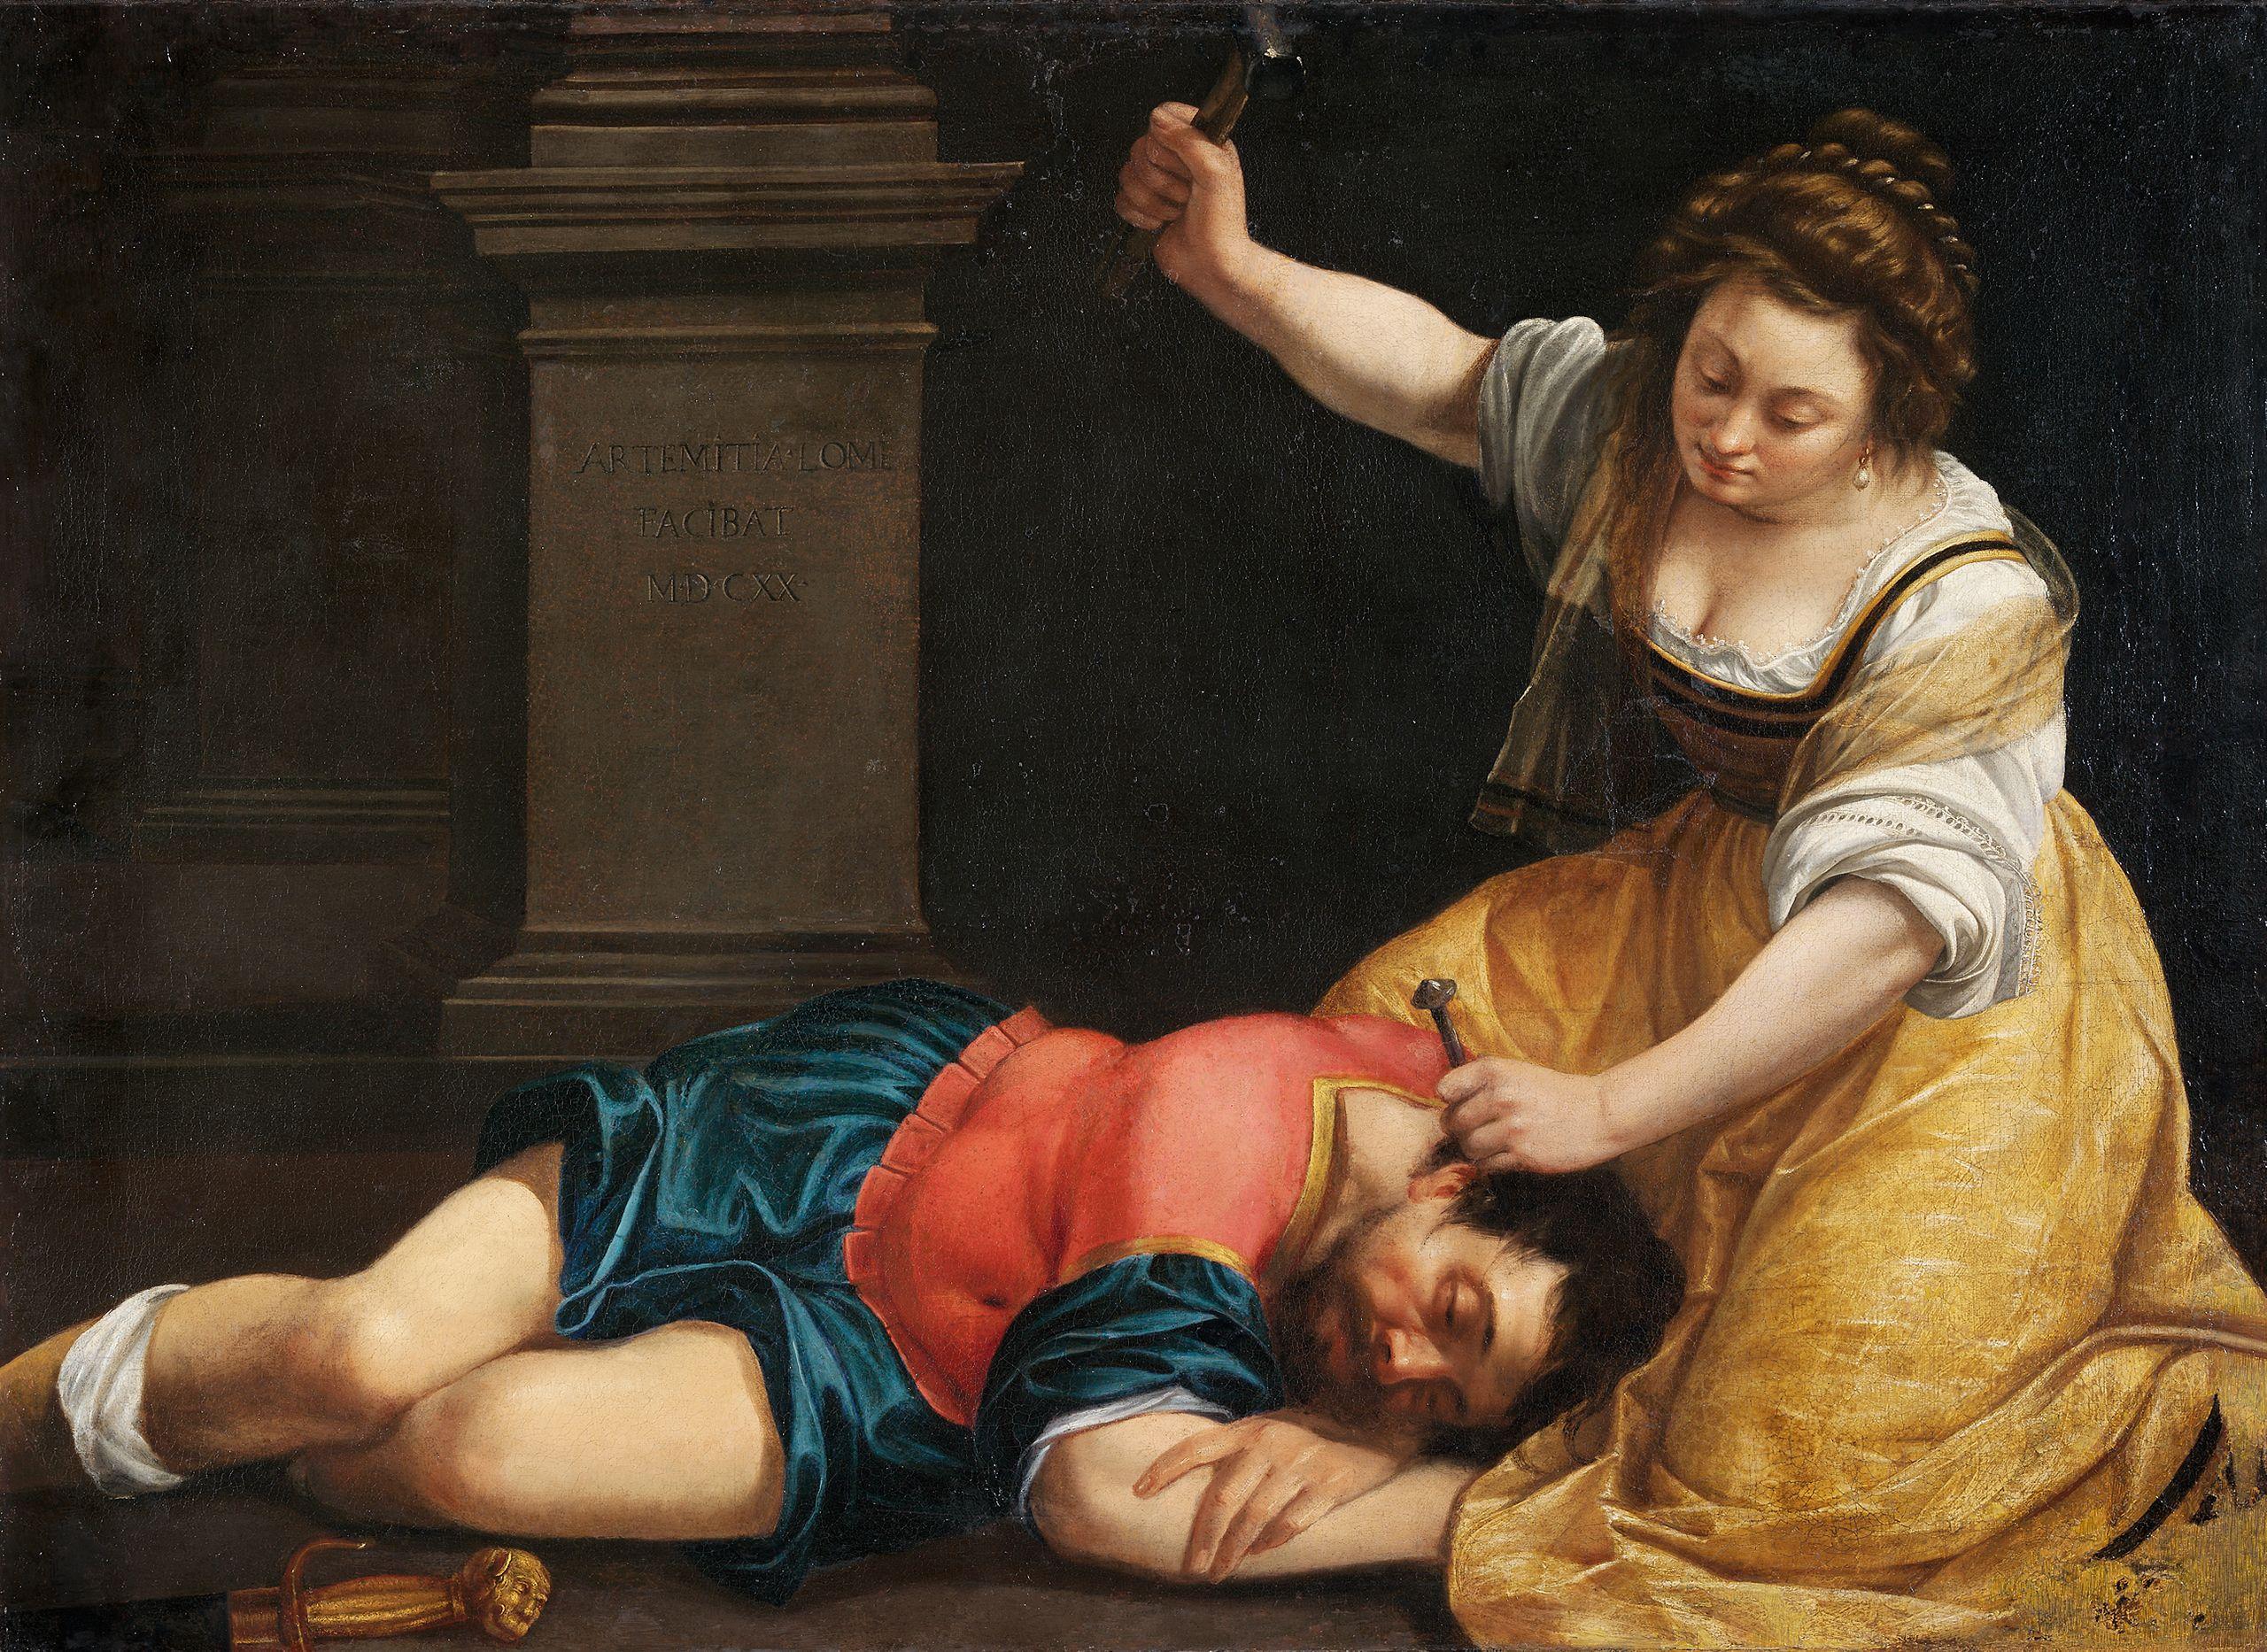 Artemeisa and the theatre of revenge | Christie's